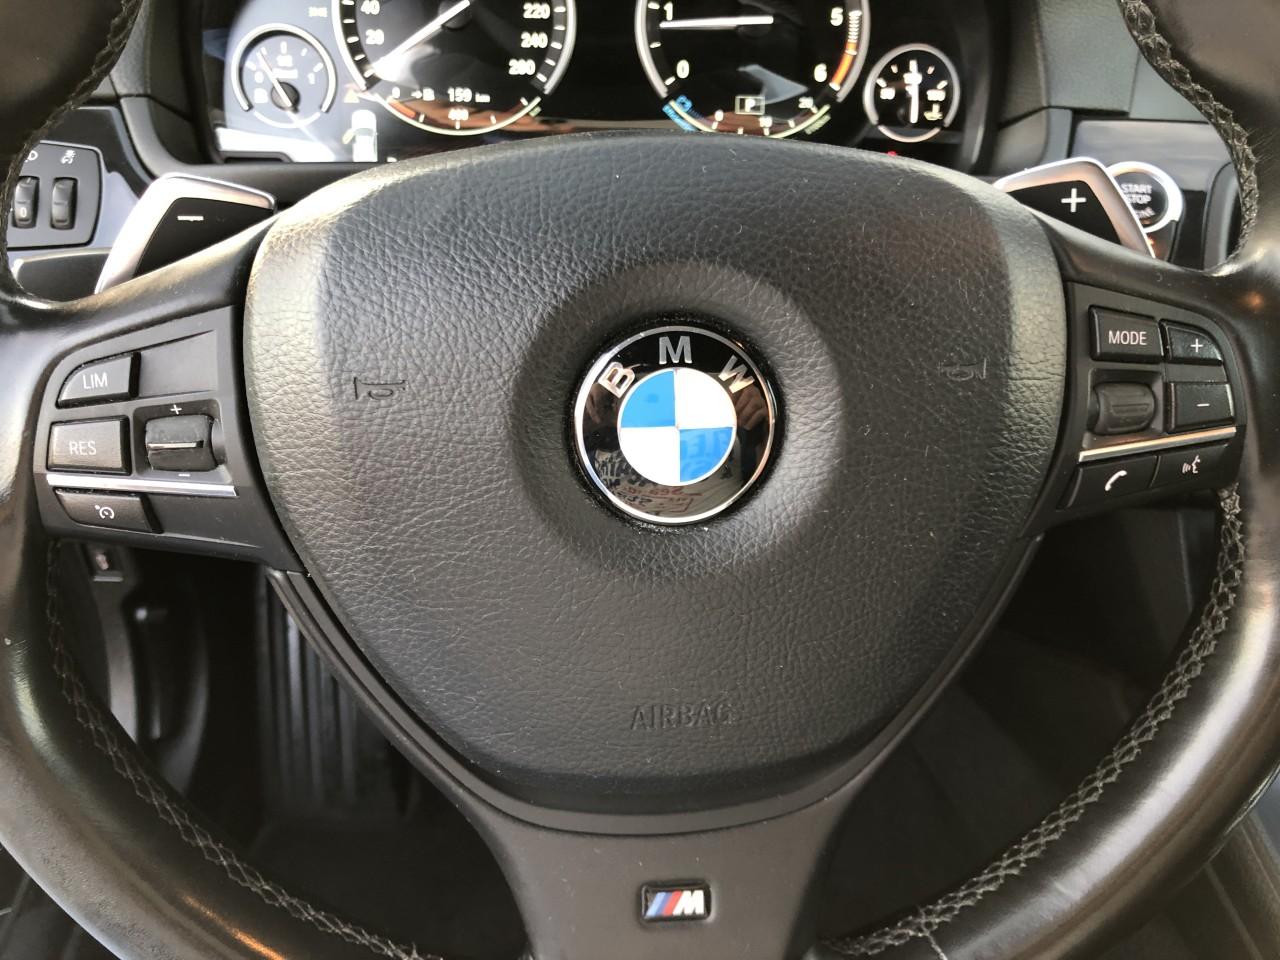 BMW 520 BMW F10 520d 184Cp Euro 5 Automata/Navi MARE/Semi-piele/Padele volan/Jante 19/etc… 2012